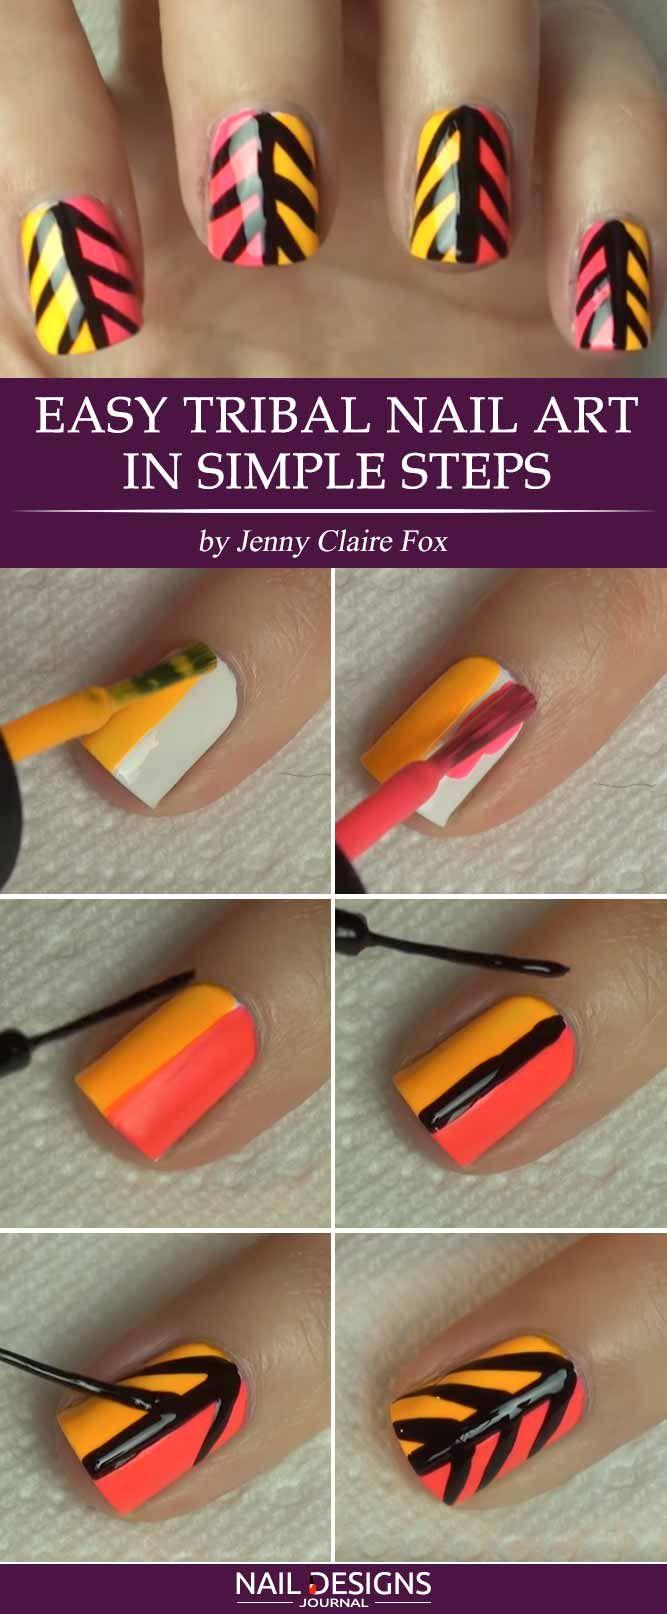 17 Super Easy Nail Designs Diy Tutorials Pinterest Nail Salons